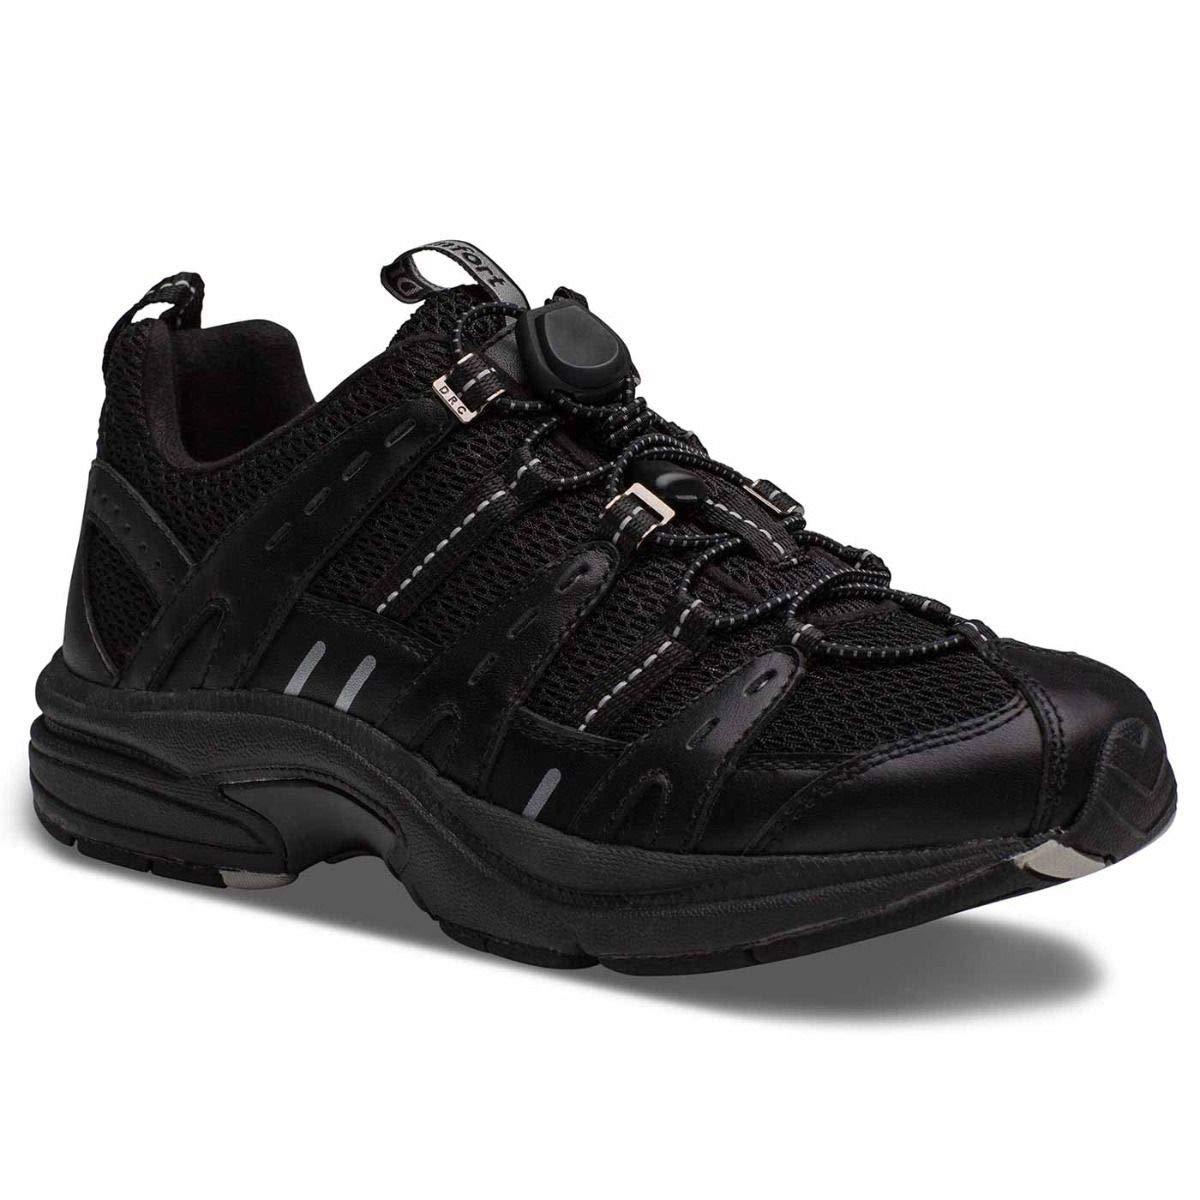 Dr. Comfort Refresh Women's Therapeutic Diabetic Extra Depth Shoe: Black/Black 9.5 Wide (C-D)